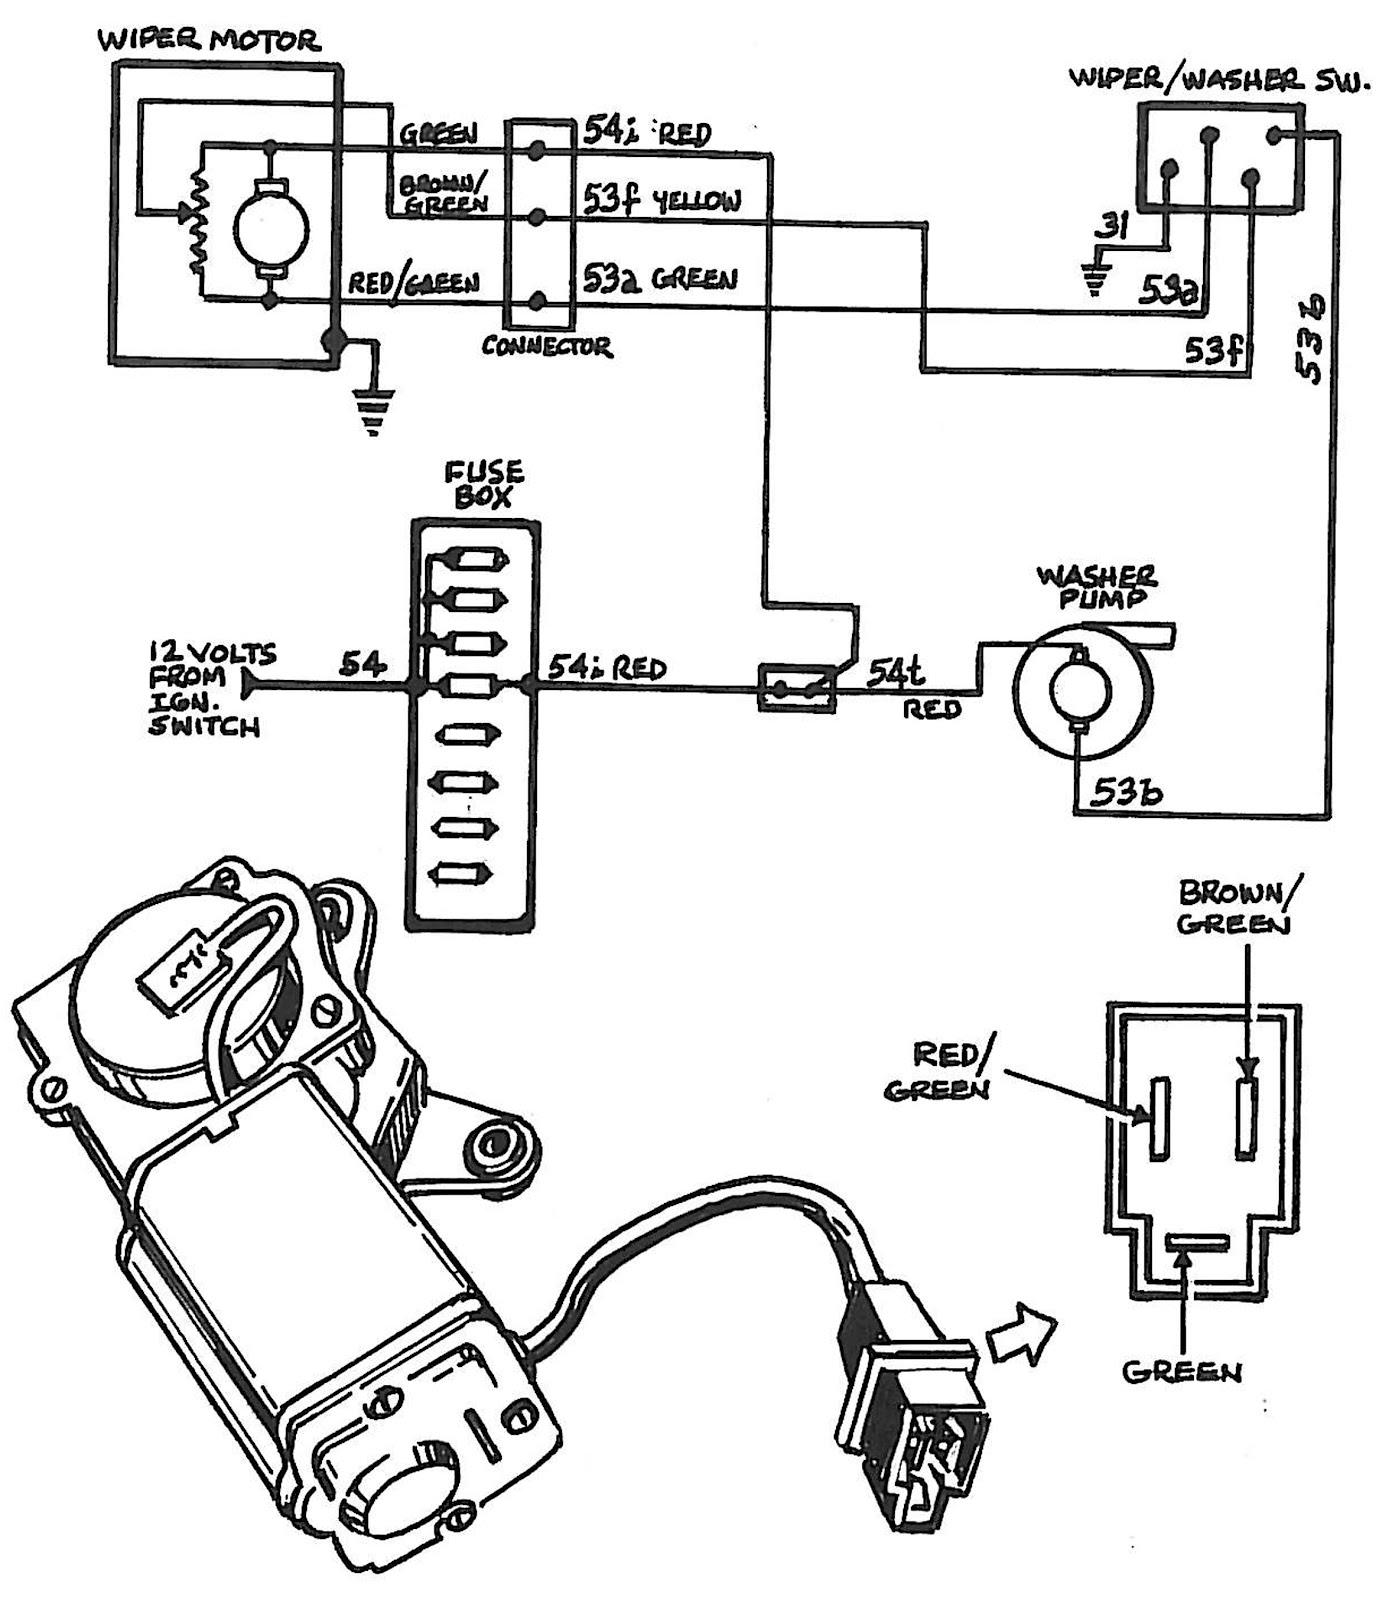 chevrolet wiper wiring diagram get free image about 78 camaro wiring diagram 1986 camaro dash wiring [ 1379 x 1600 Pixel ]